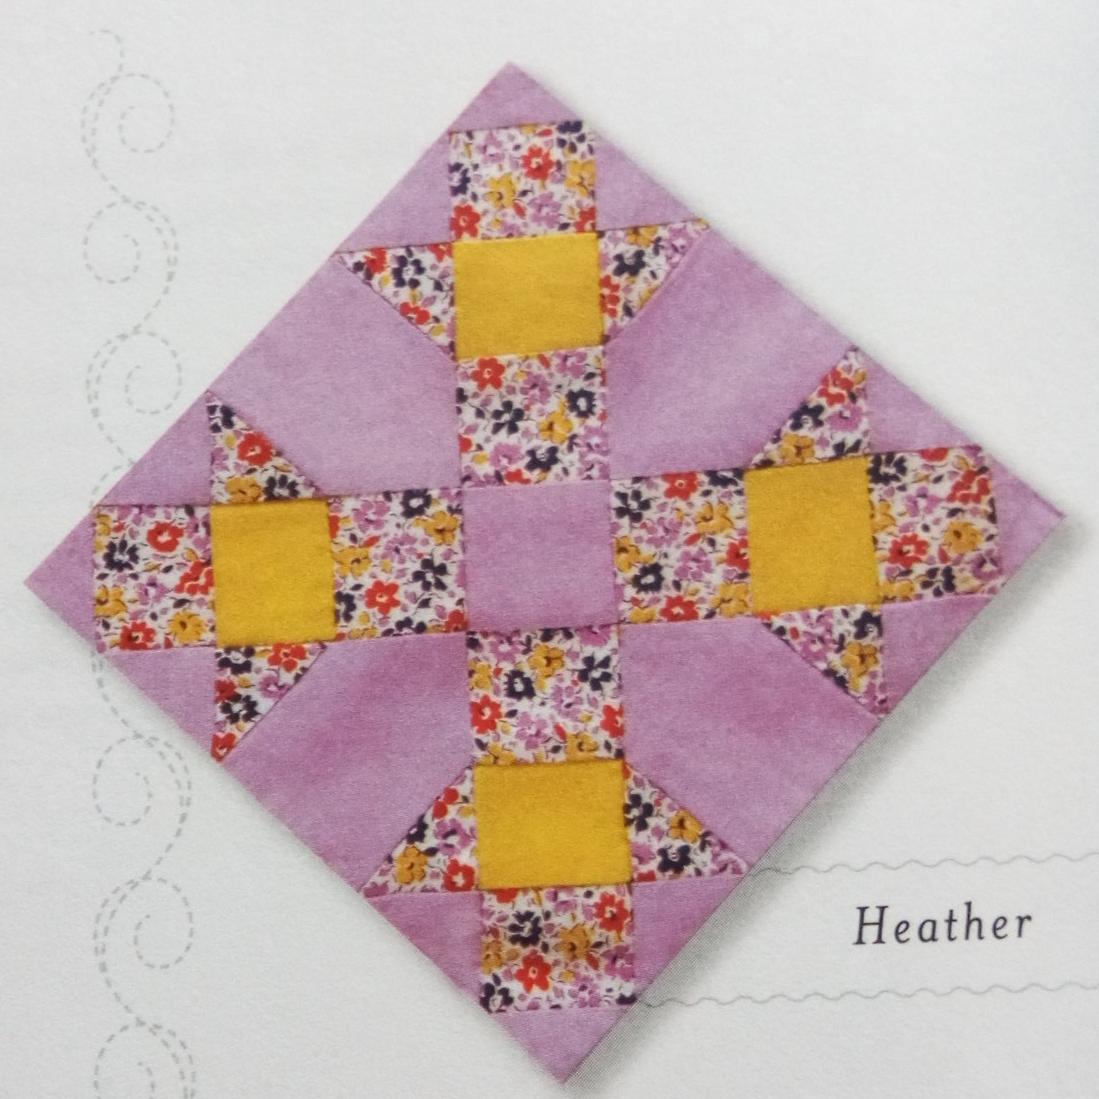 Heather: Coming November30